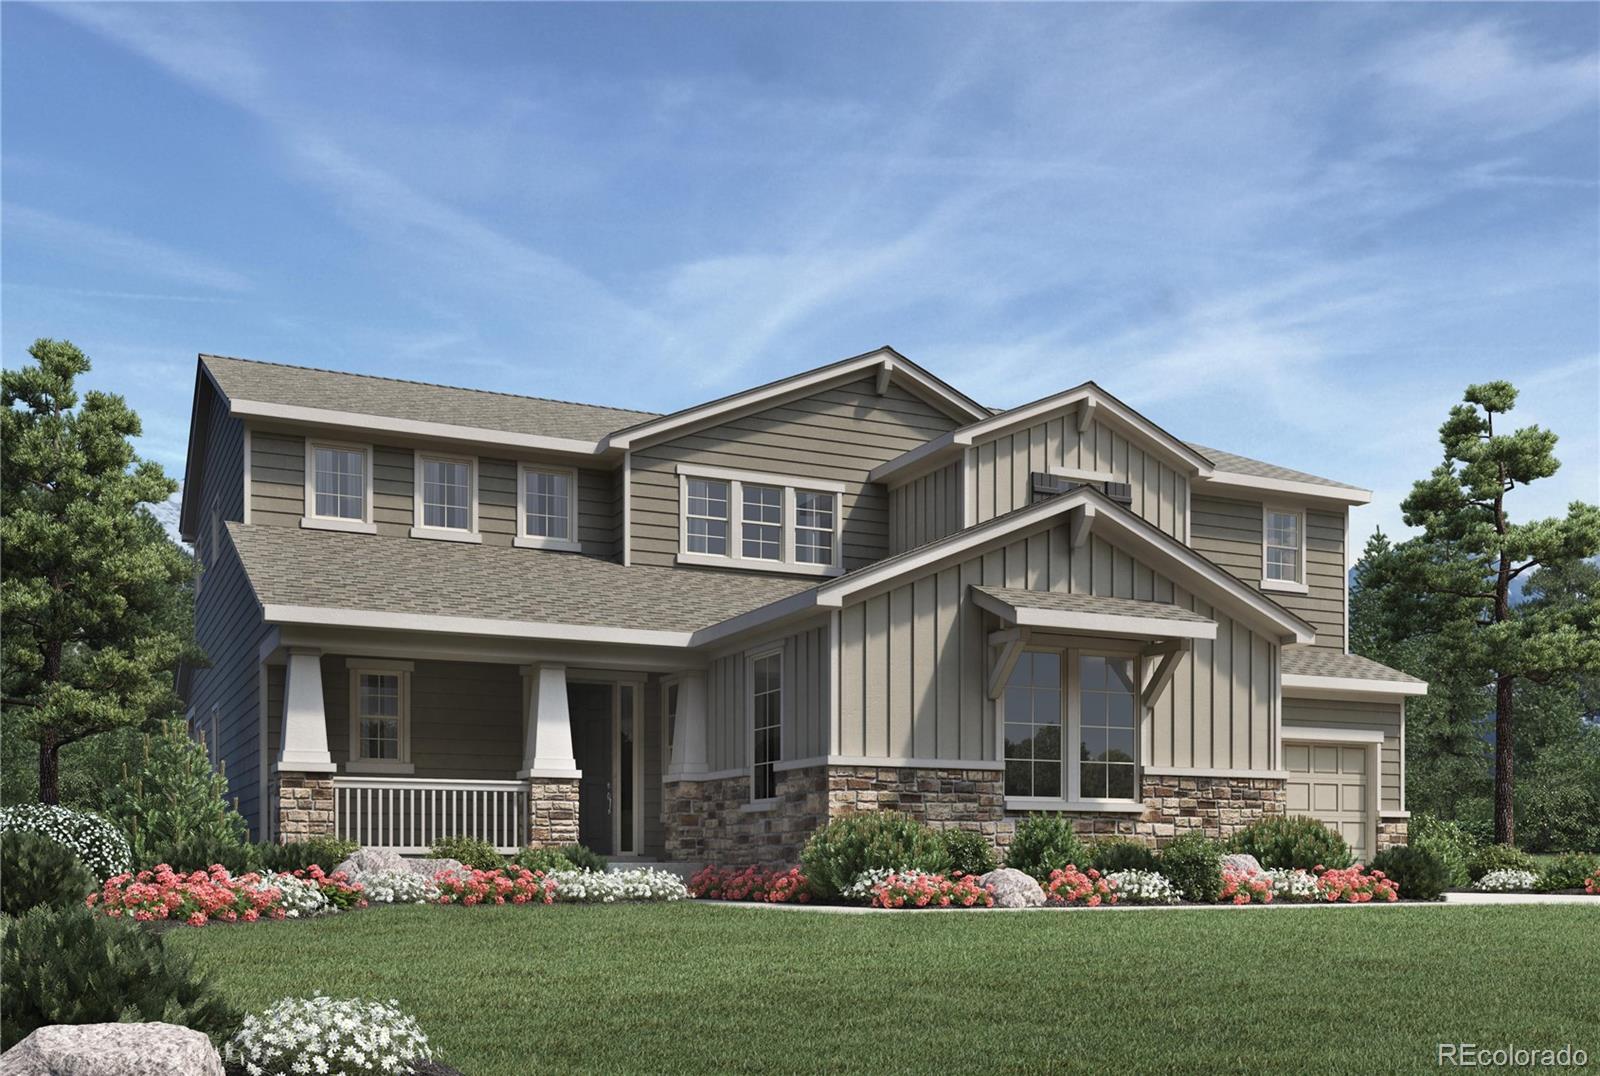 6209 Fishhawk Court, Fort Collins, CO 80528 - Fort Collins, CO real estate listing